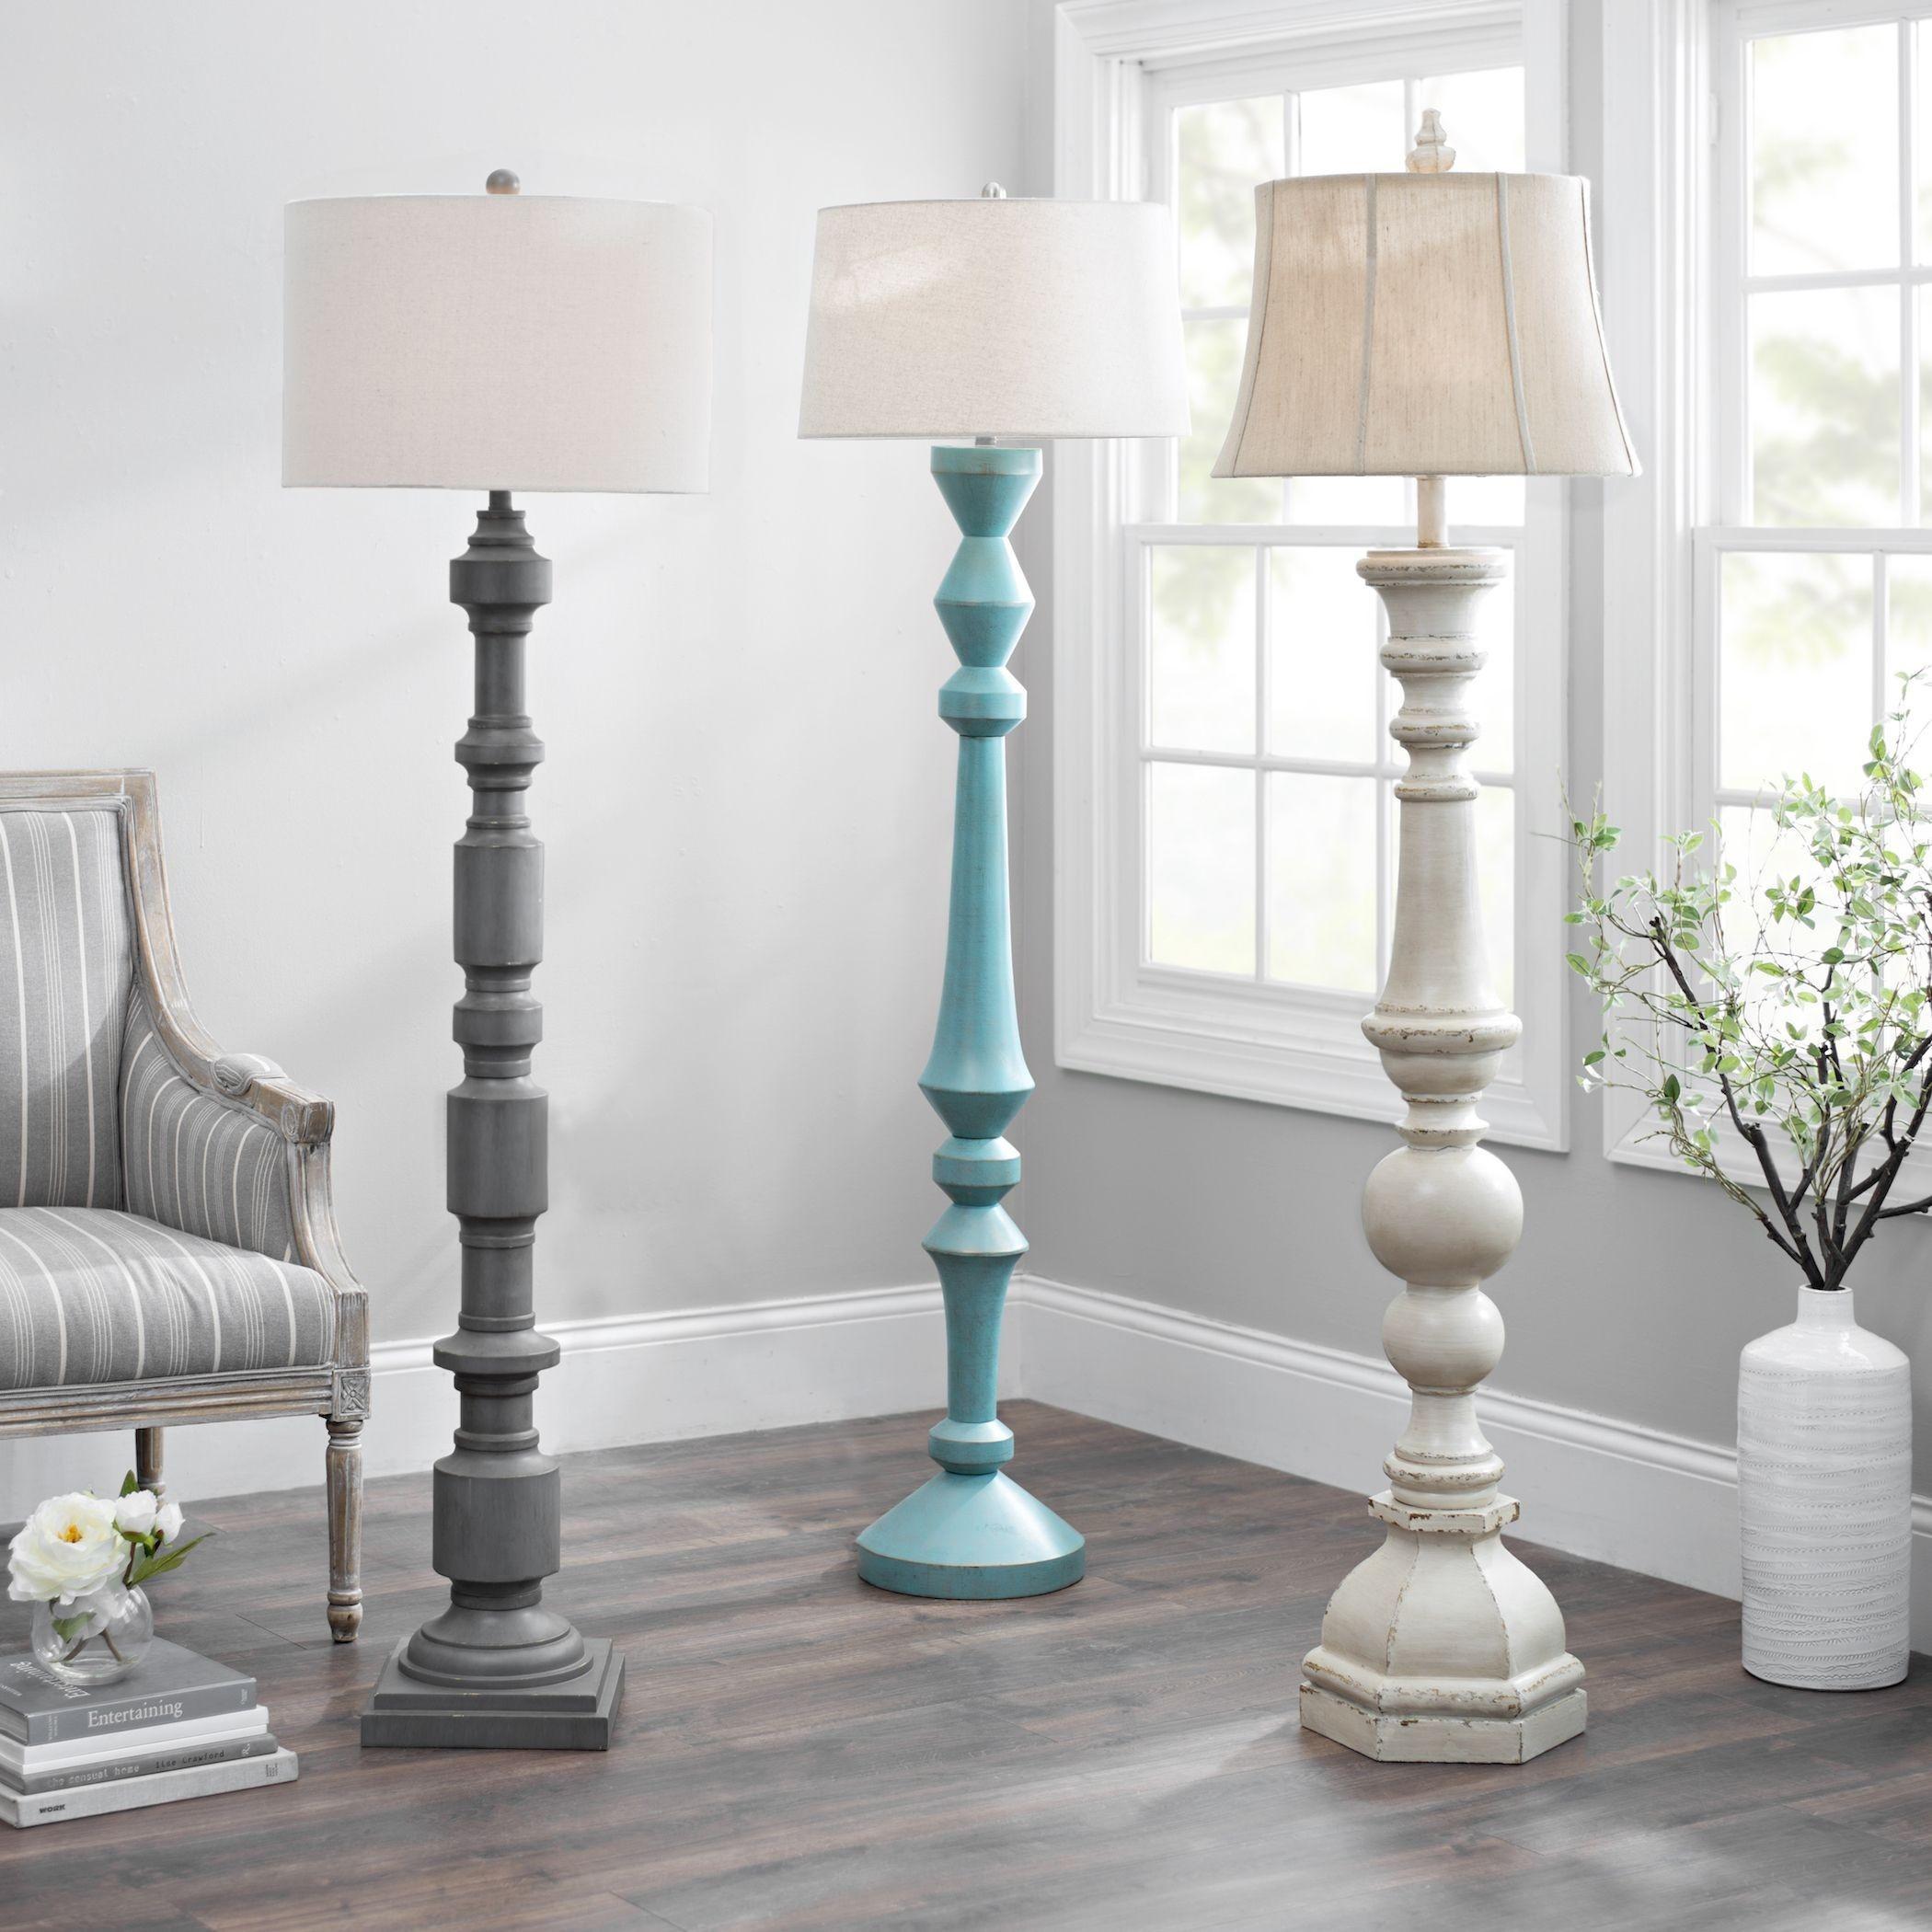 Vase Lights Of Inspirational Living Room Lamp Home Design Minimalist Inside Cool Floor Lamps Elegant Living Room Lamps New Living Room Vases wholesale New H Vases Big